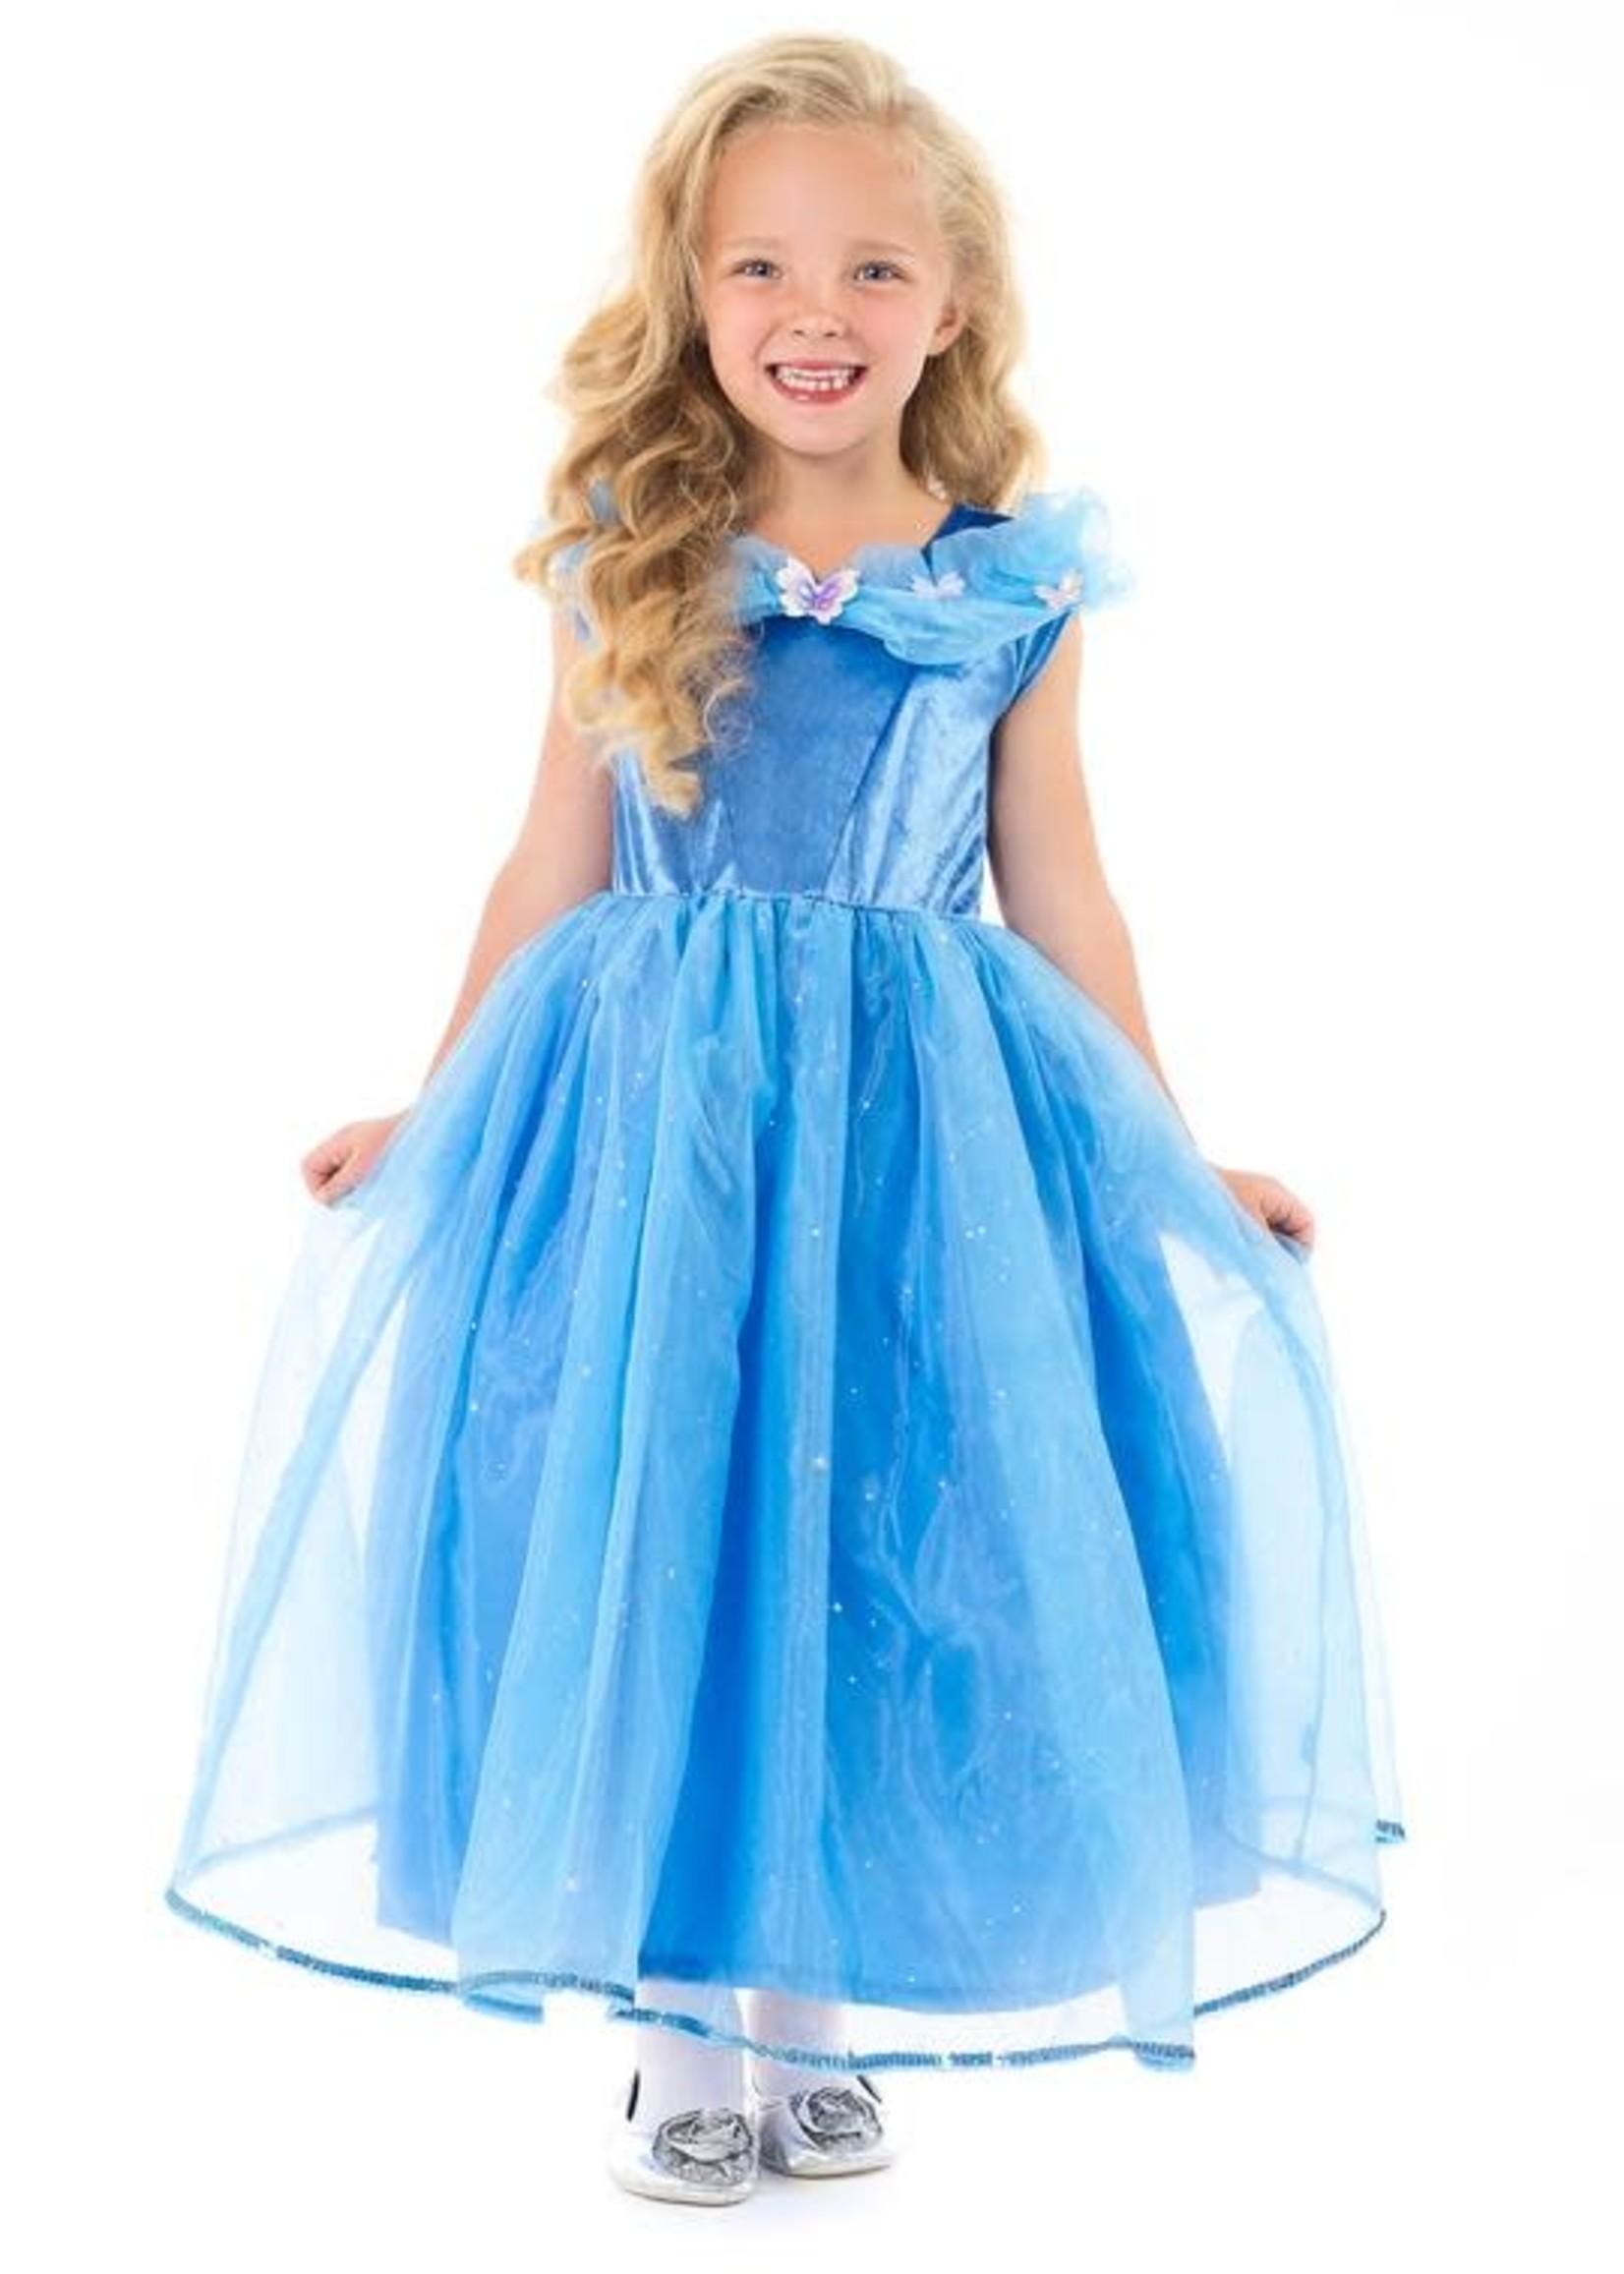 Little Adventures Deluxe Cinderella ButterFly, LGe